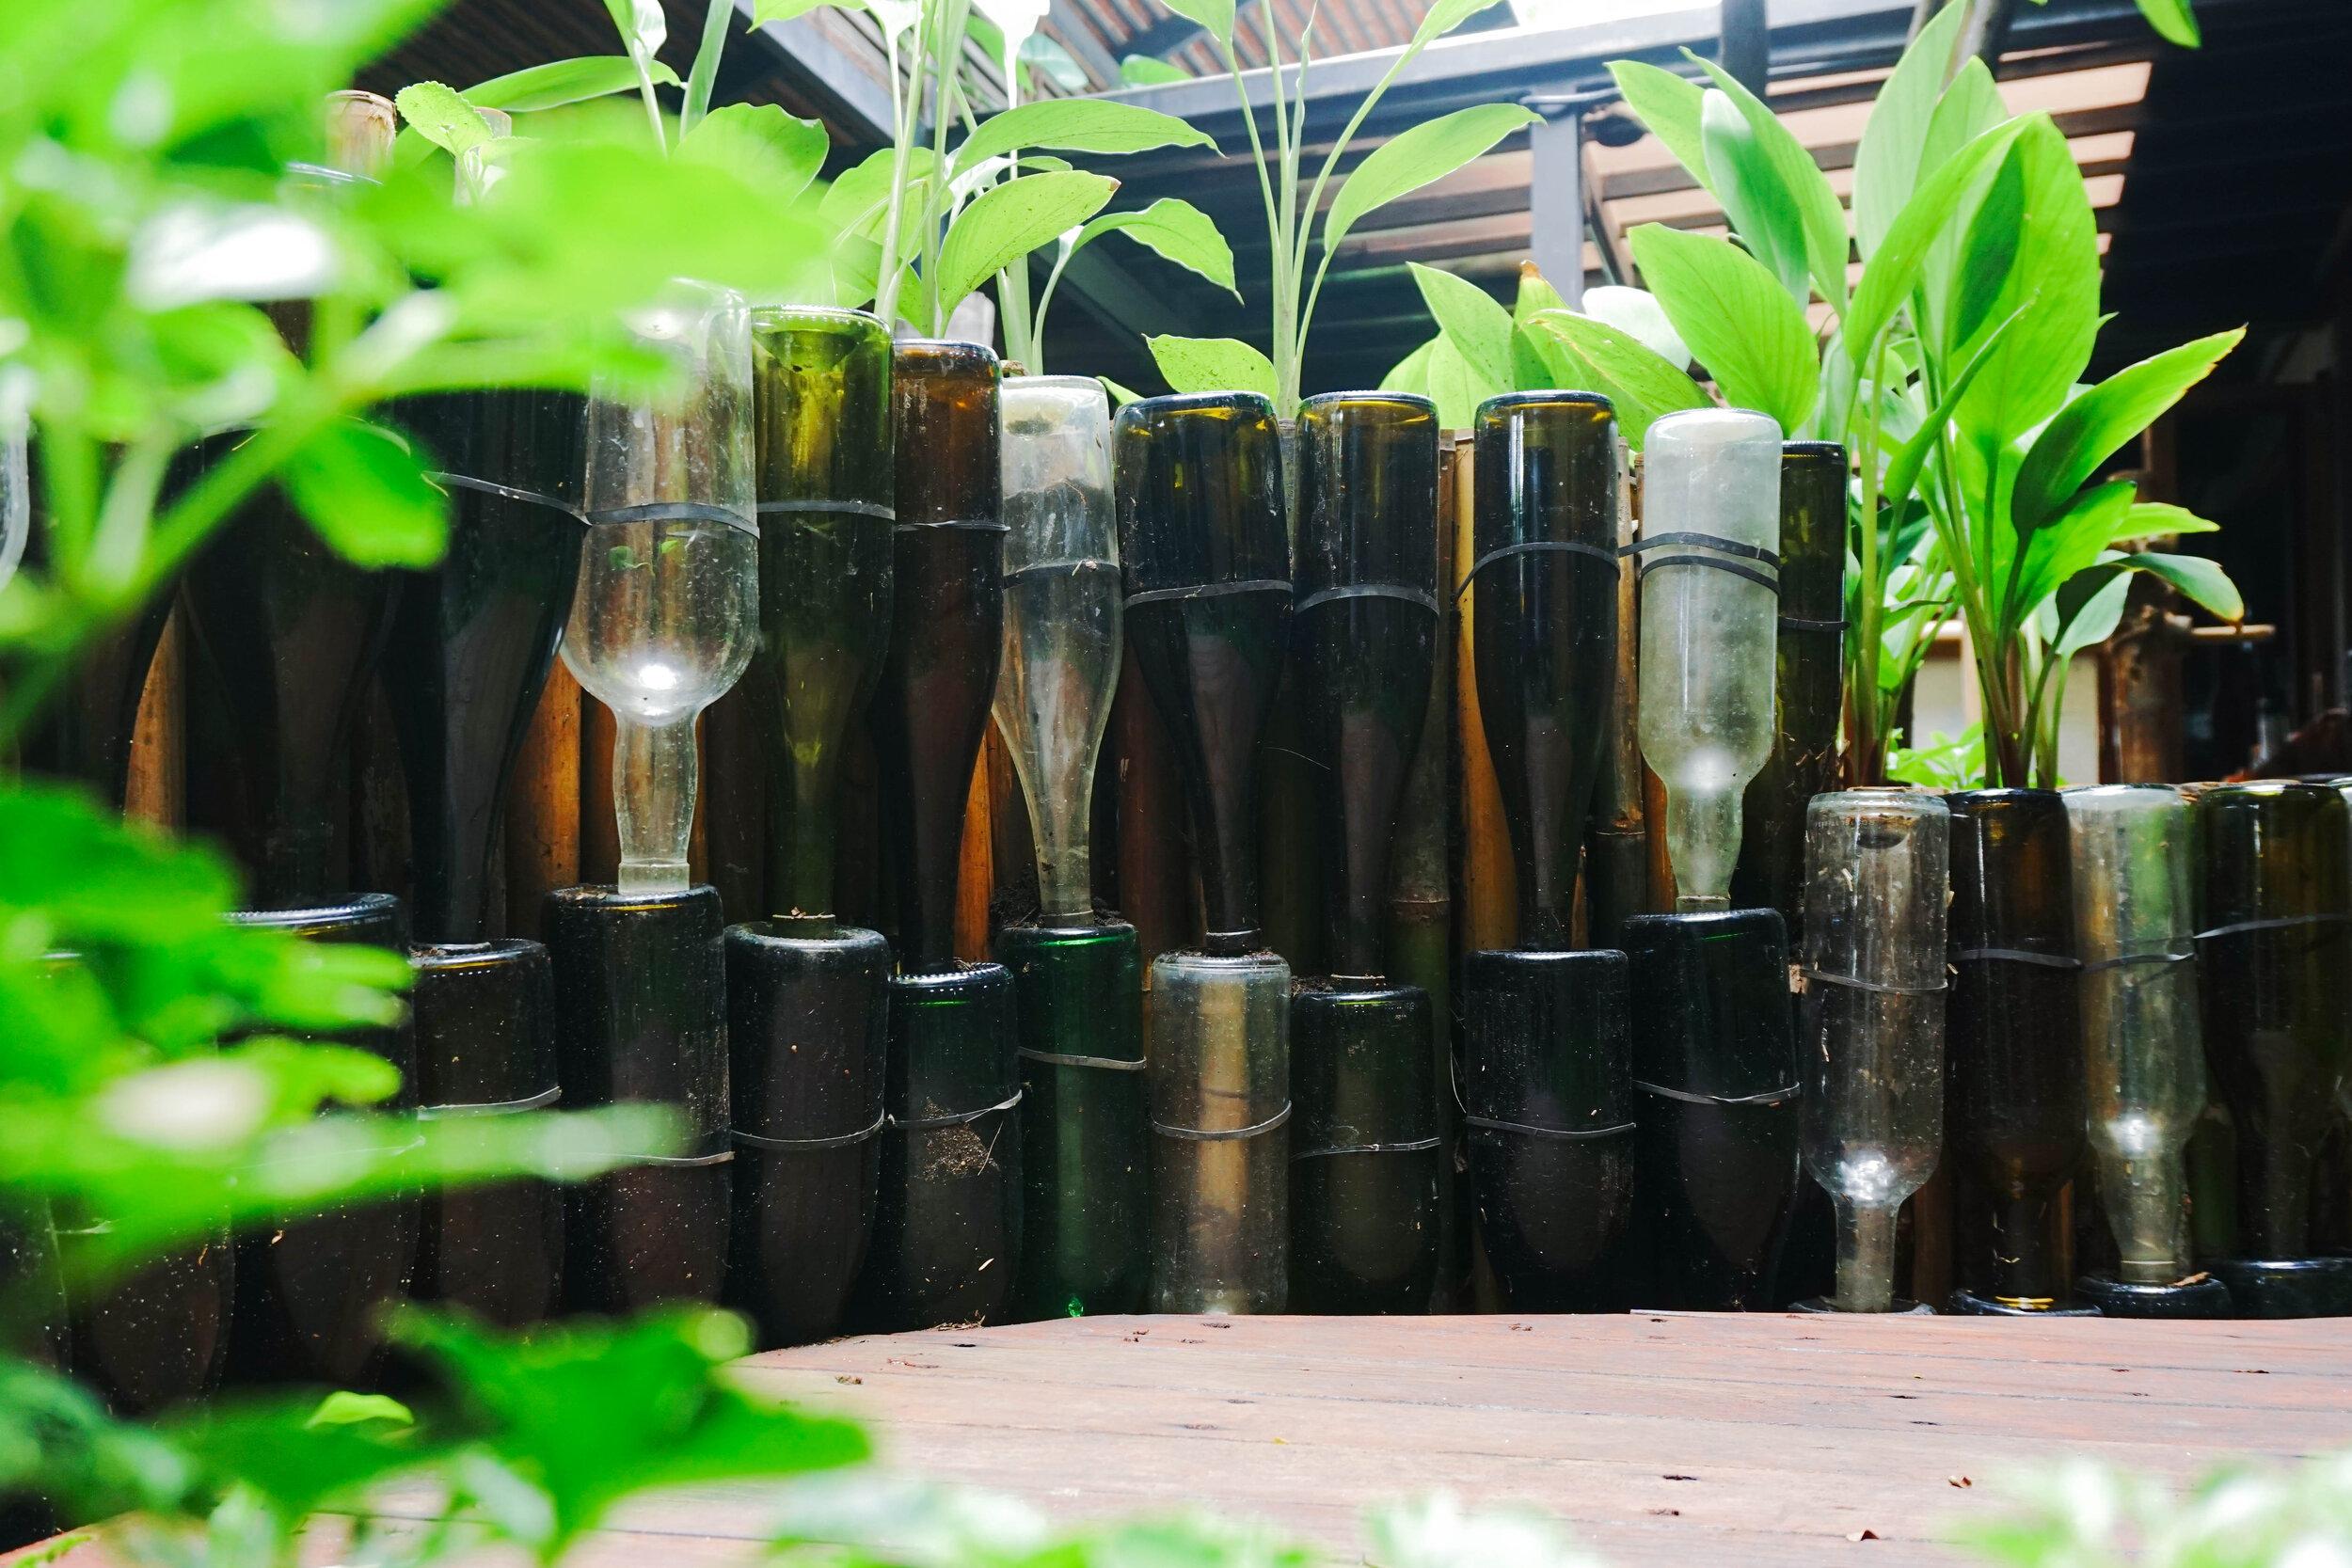 Bo.lan Edible Garden: Keyhole Garden in ZONE C - The Fragrant Herb Garden